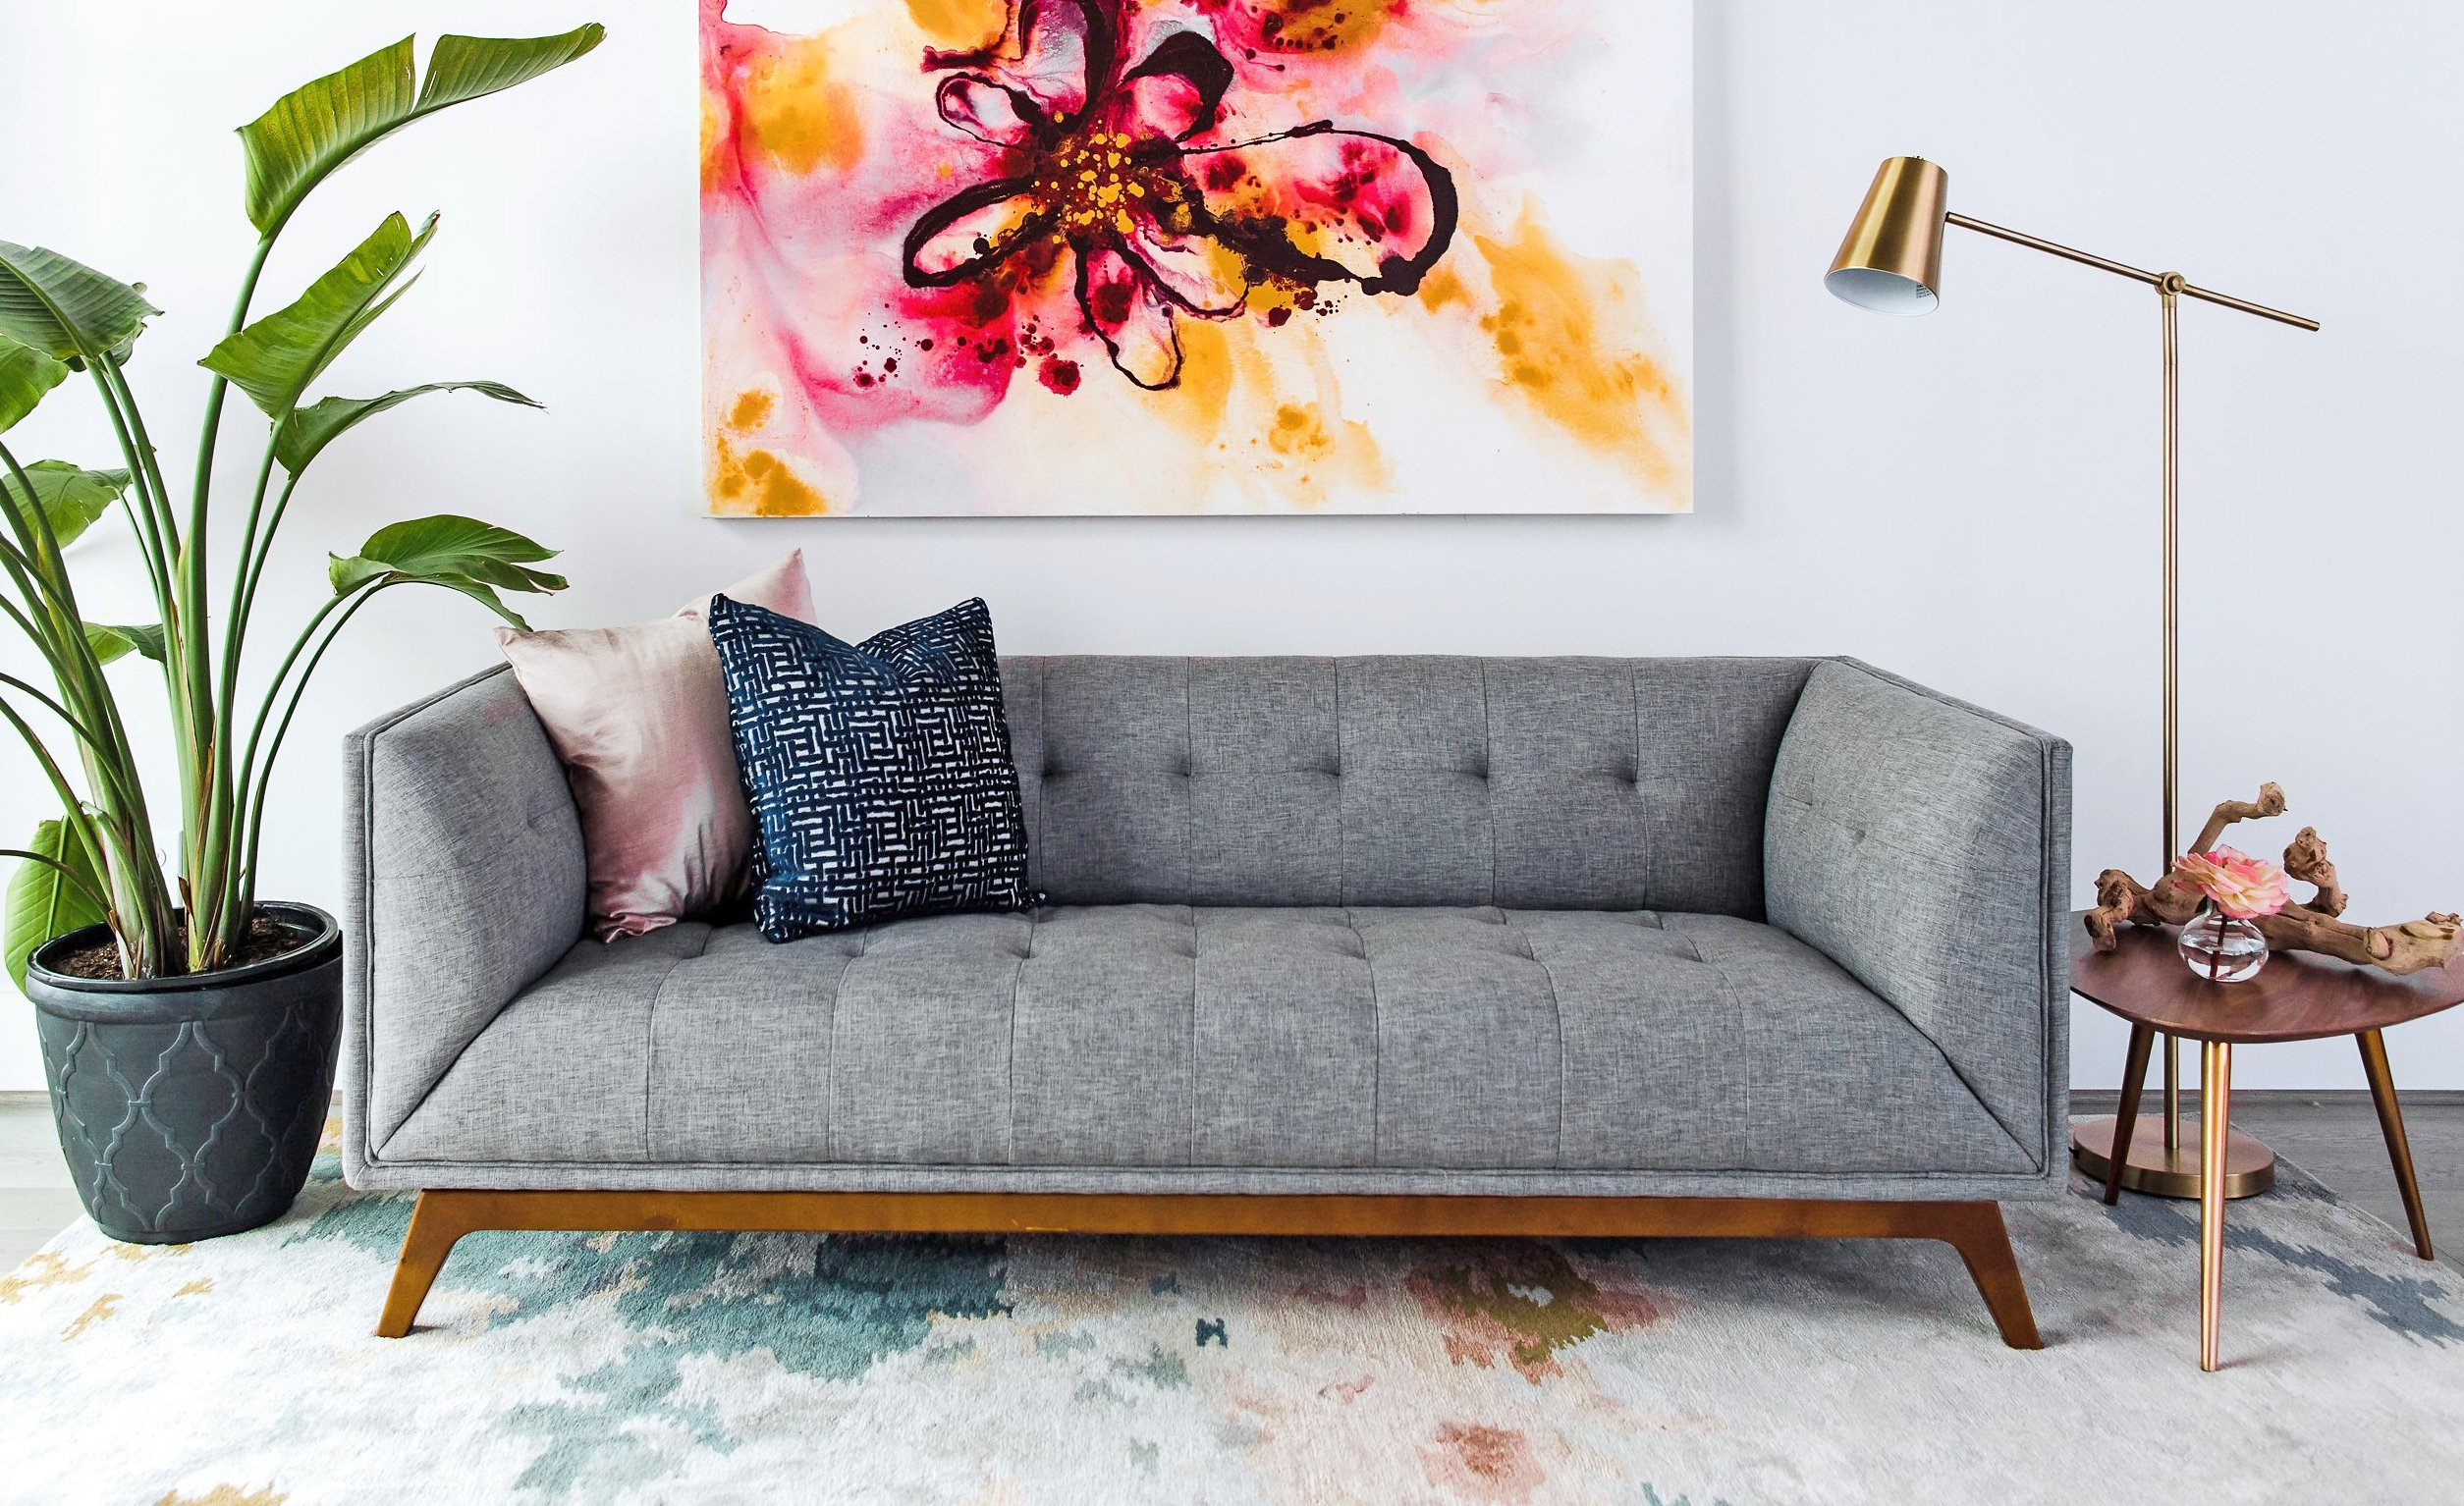 REGENT PARK Midcentury Modern Sofa Mid Century Sofas for